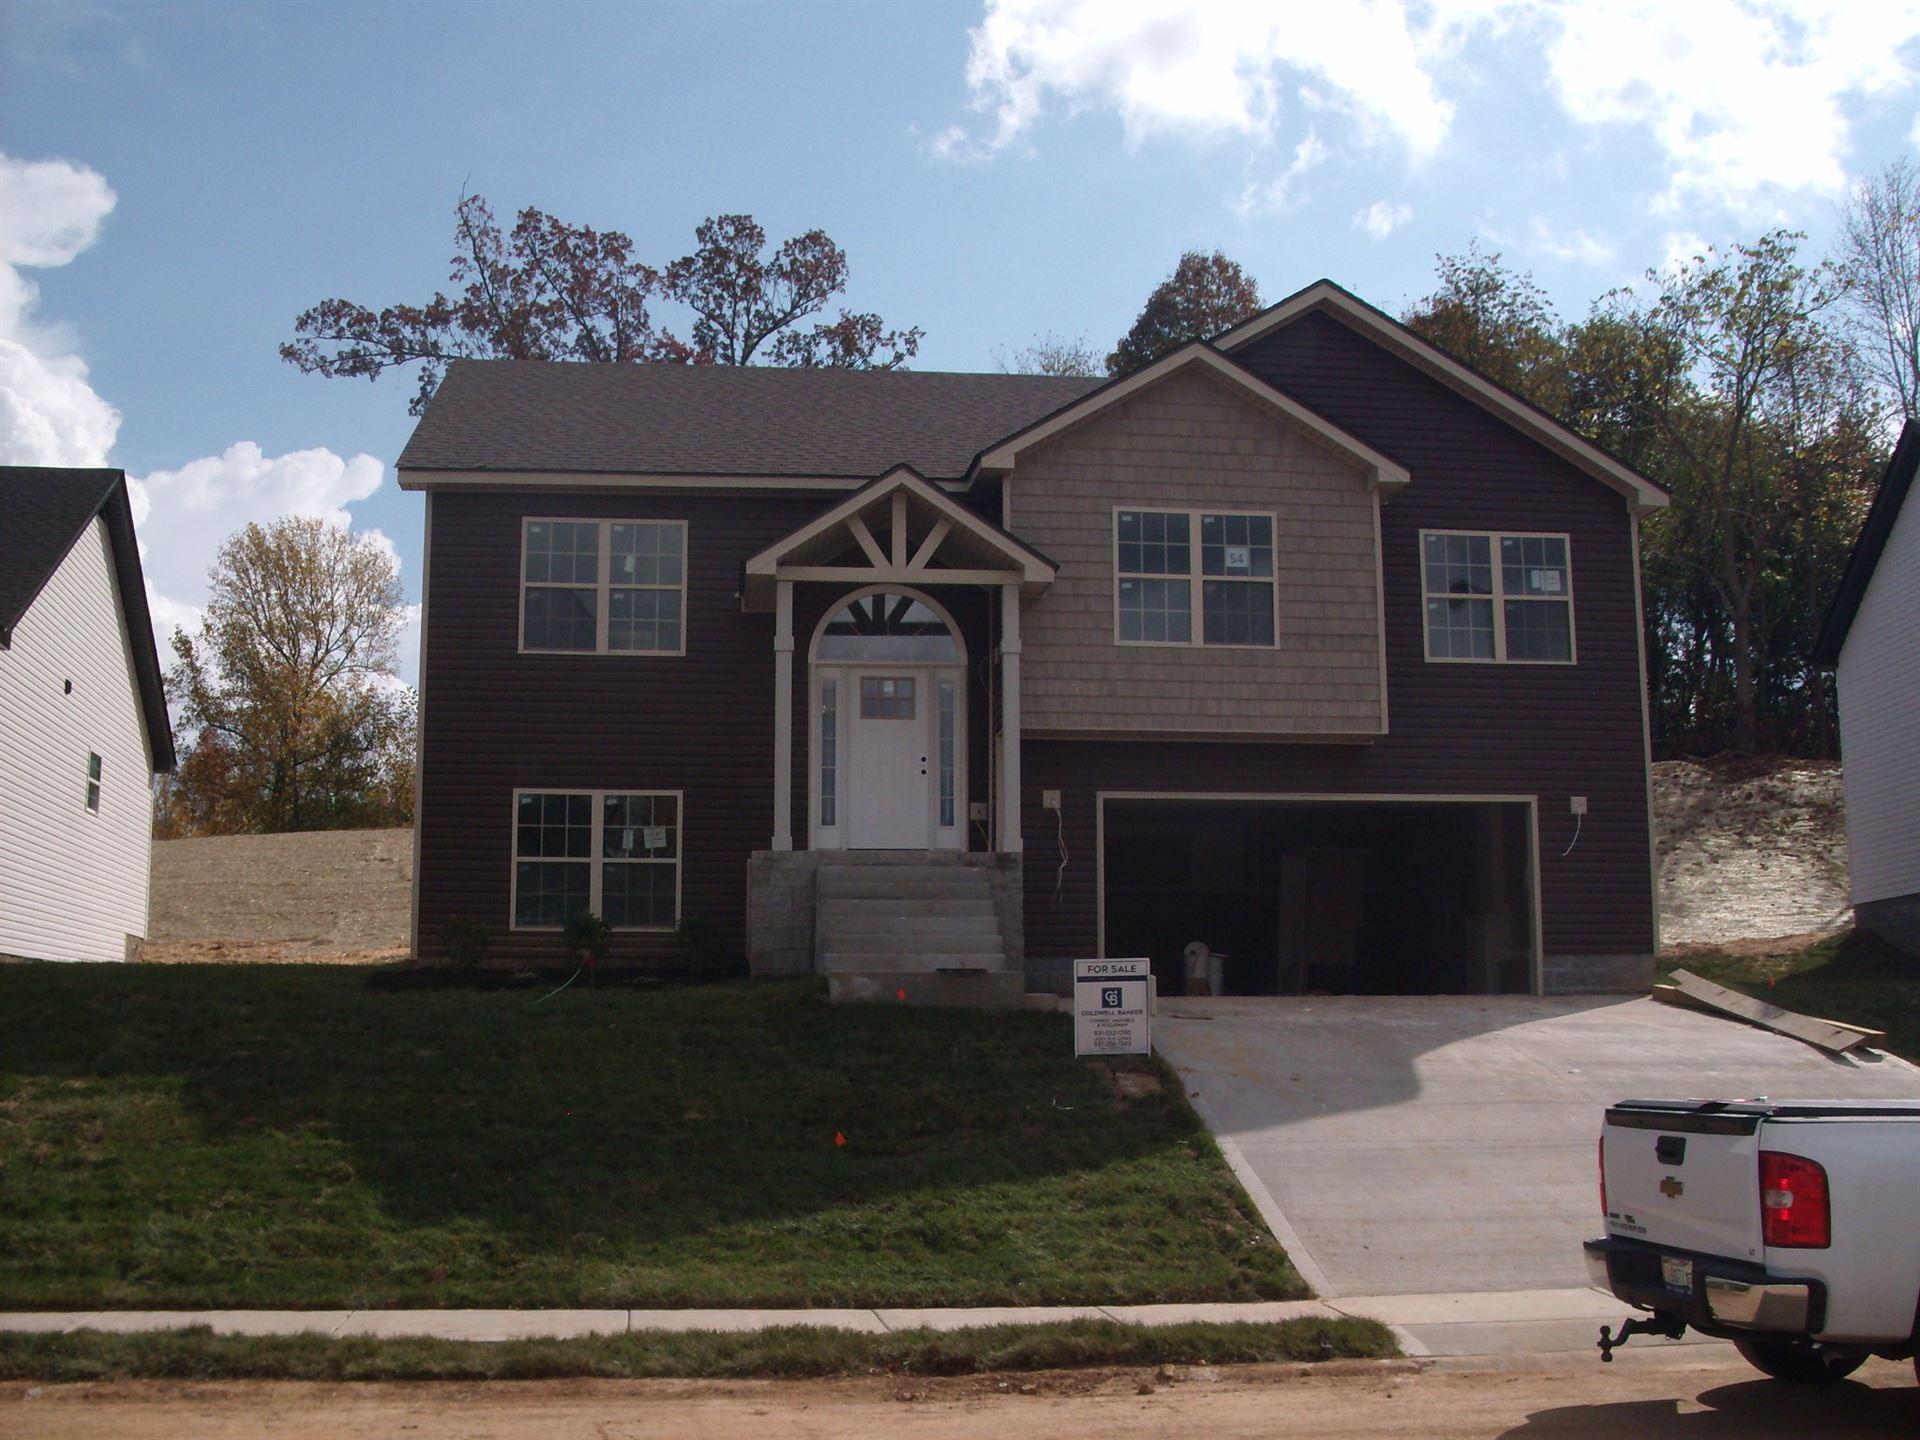 54 Chestnut Hill, Clarksville, TN 37042 - MLS#: 2191221